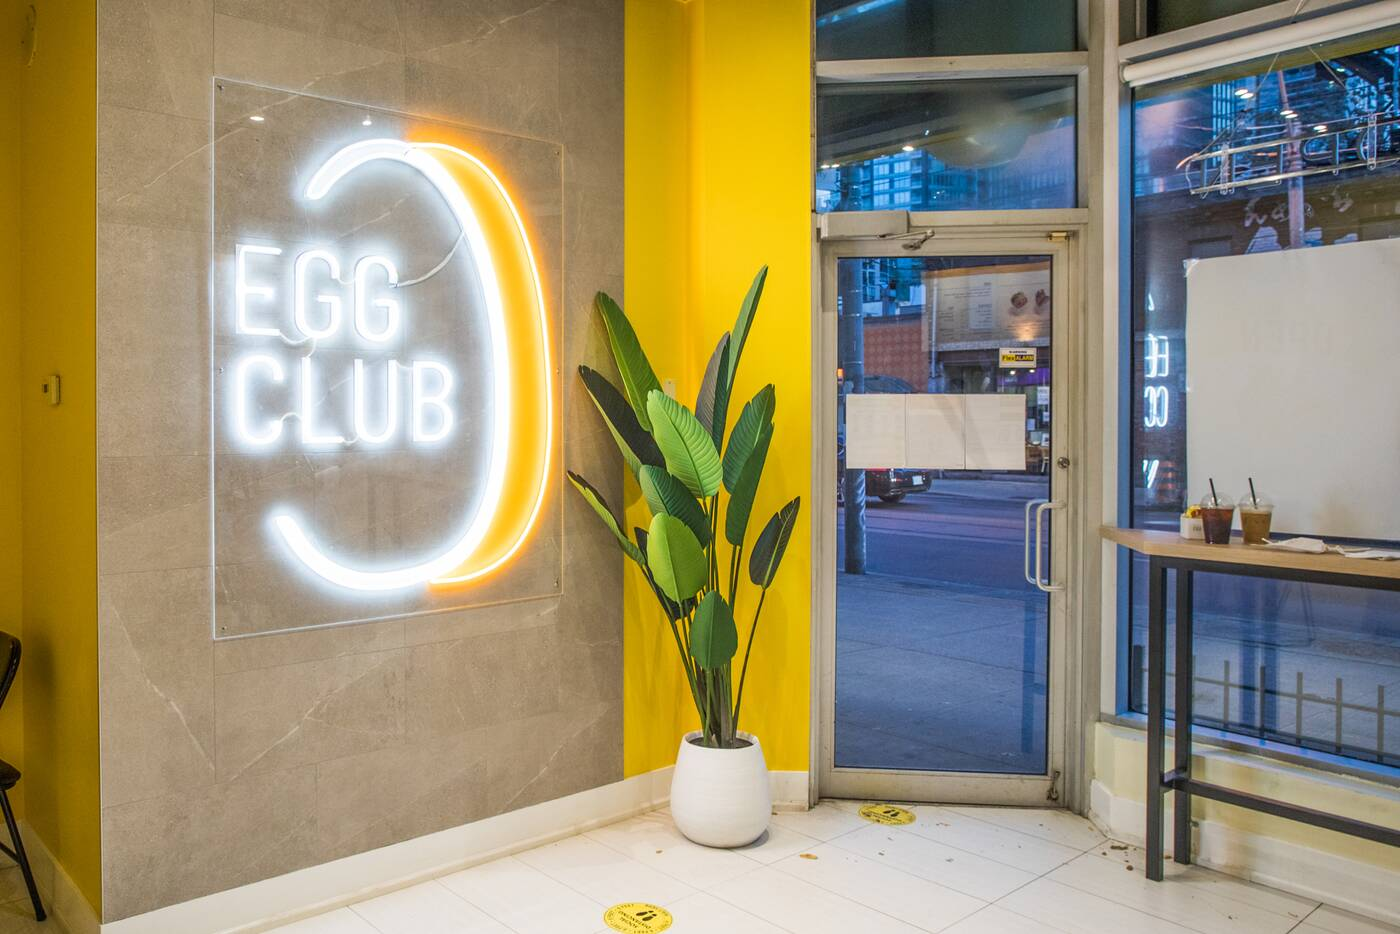 egg club toronto